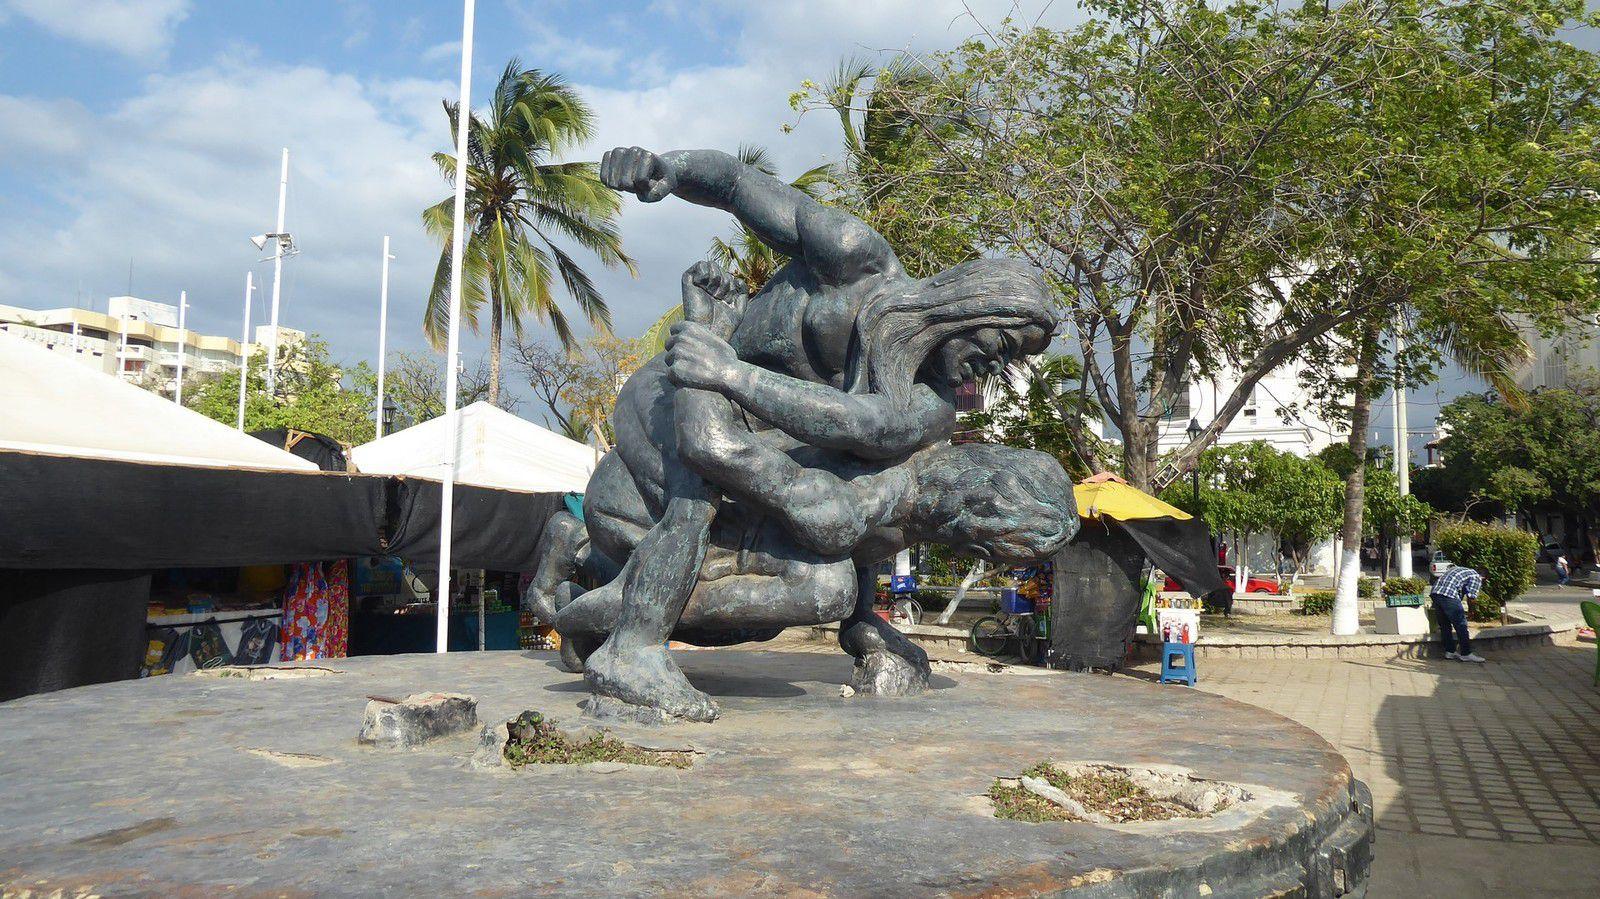 J36 - Jeudi 23 Janvier 2020 - Santa Marta - Bus de nuit pour Bucaramanga.